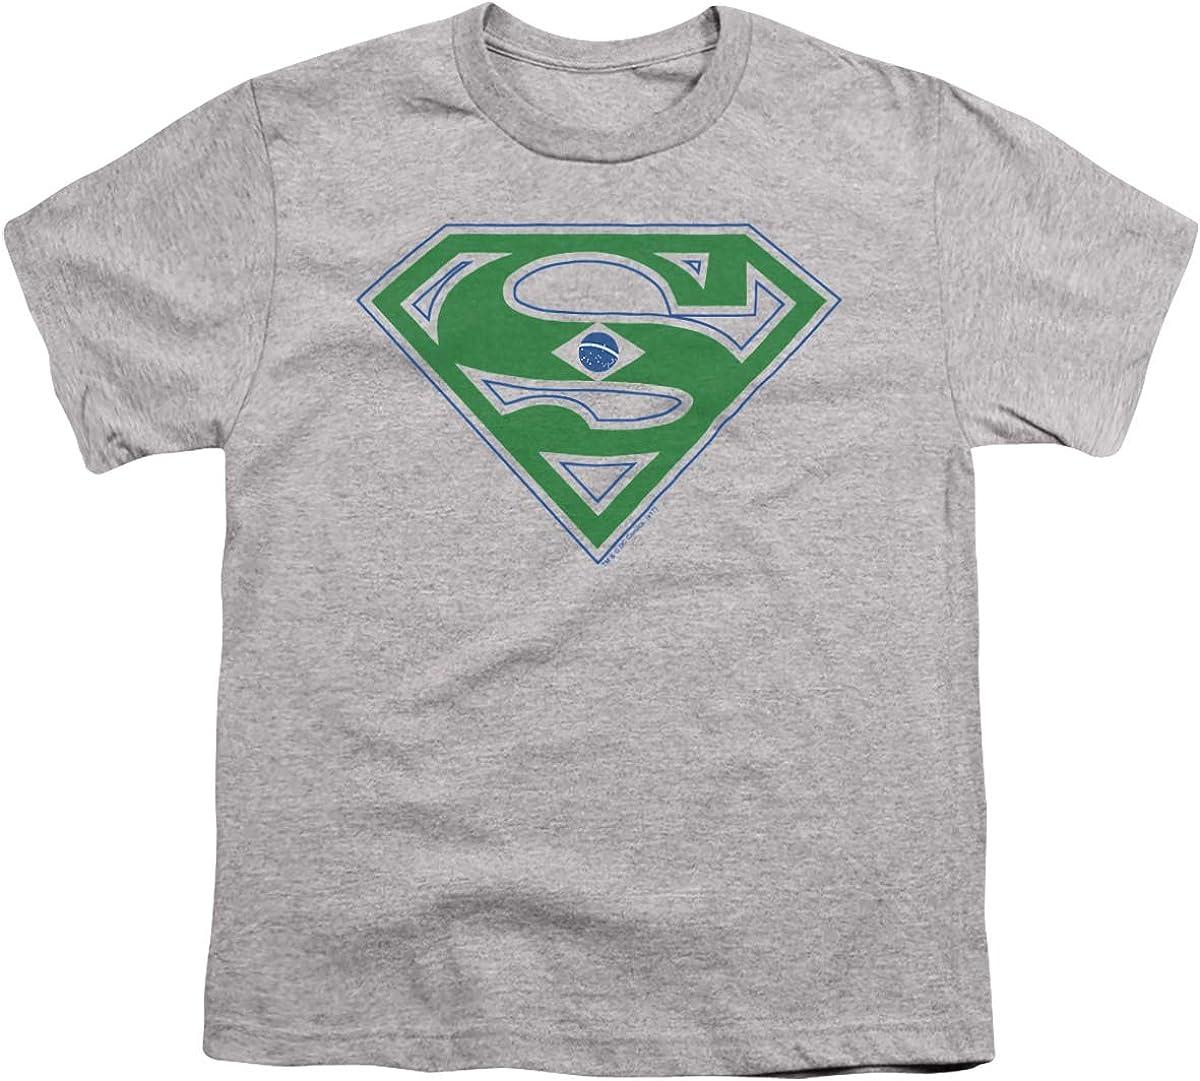 Superman Brazil Shield Unisex Youth T Shirt